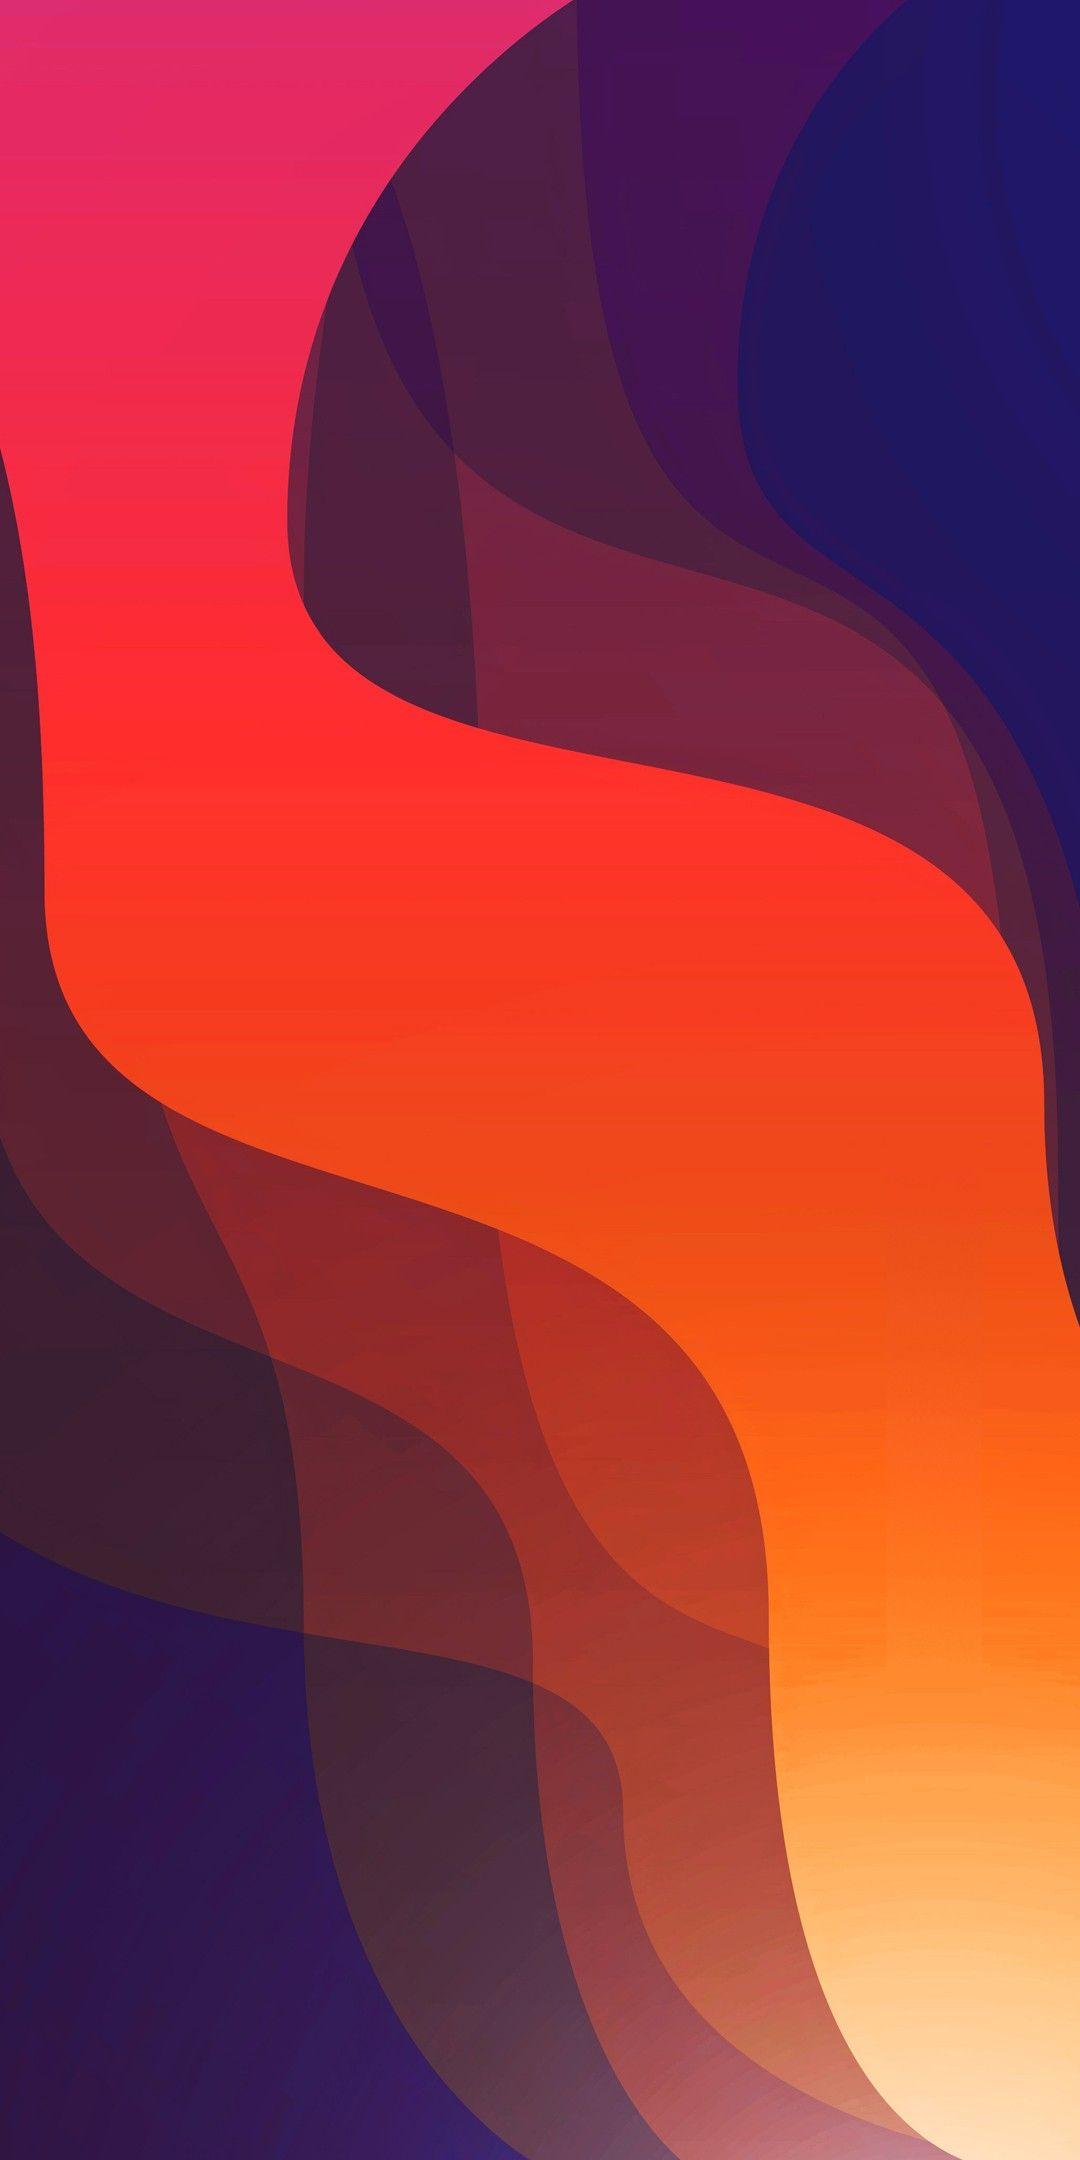 Redmi 6 Pro Abstract Wallpaper Backgrounds Desktop Wallpapers Hd Free Iphone Wallpaper